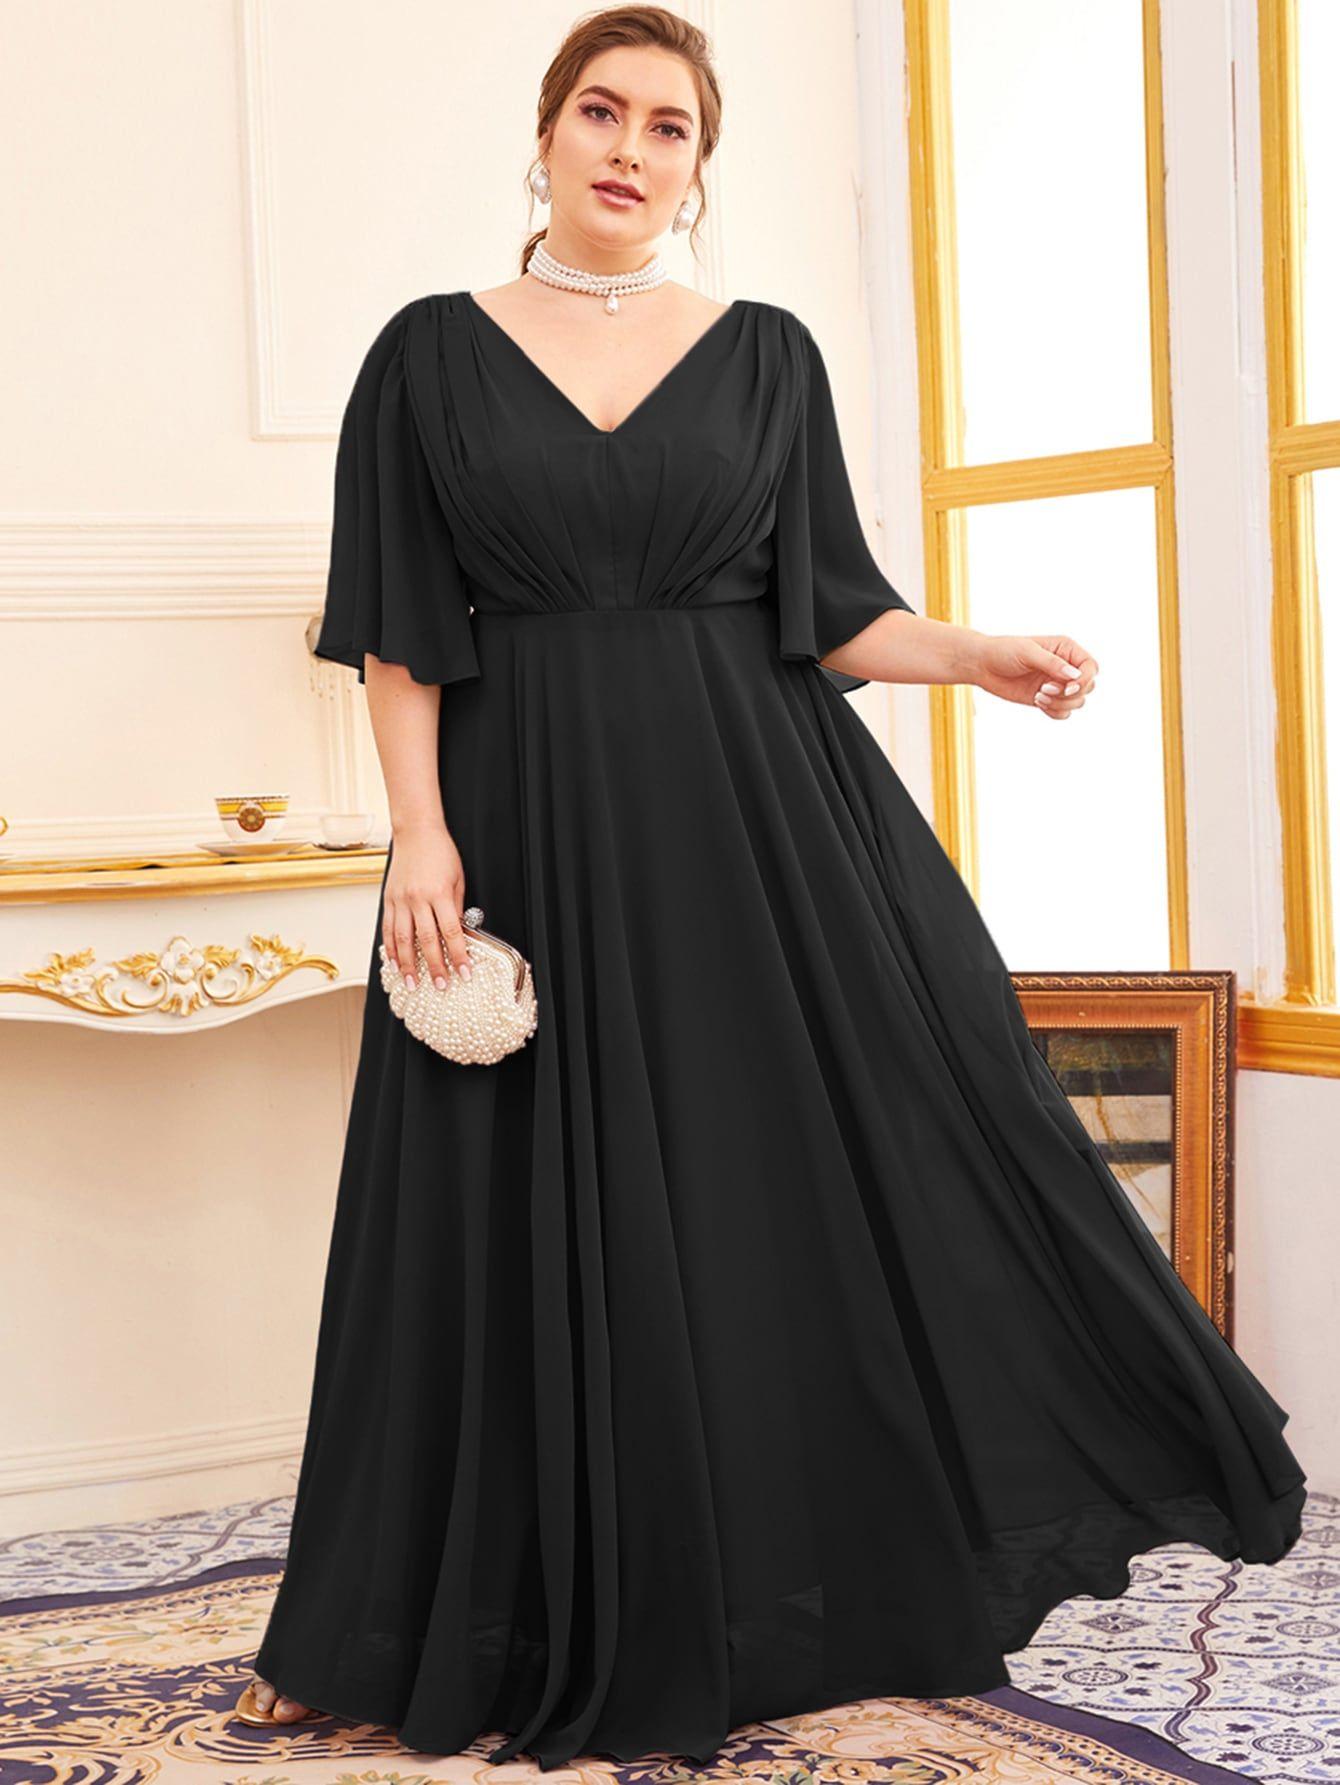 Plus Butterfly Sleeve Double V Neck A Line Dress Shein Usa Big Size Fashion Dress Bridesmaid Dresses Plus Size Black Lace Long Sleeve Dress [ 1785 x 1340 Pixel ]